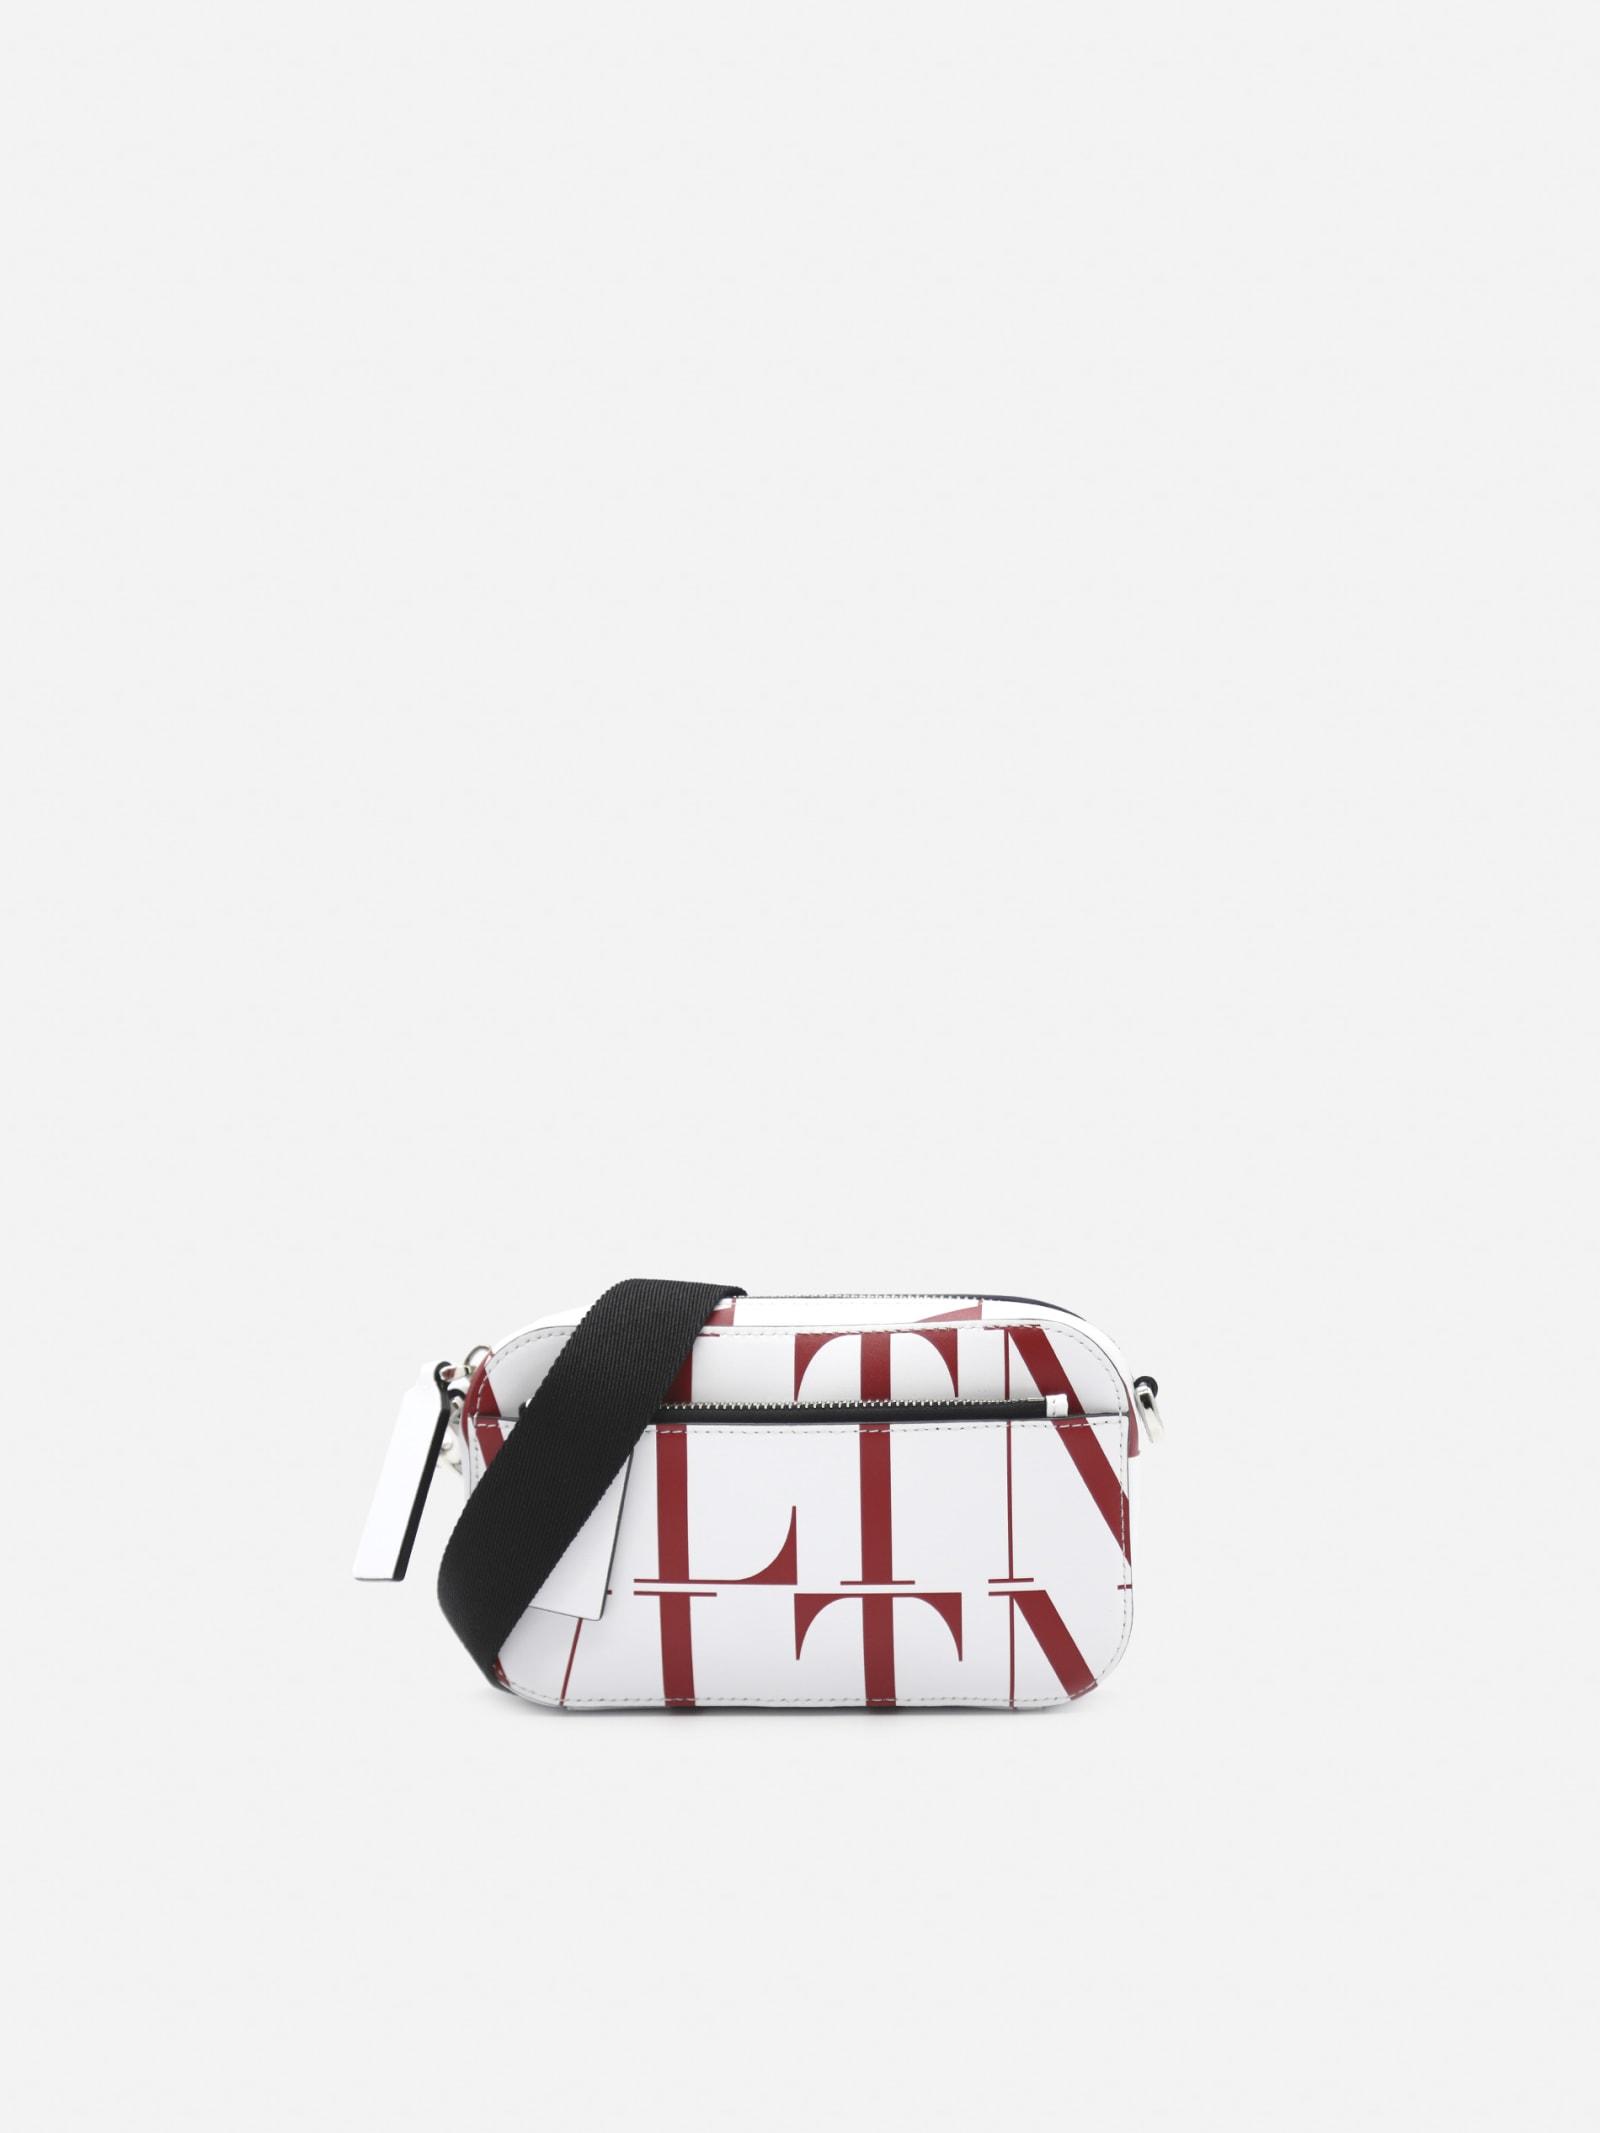 VALENTINO SMALL SHOULDER BAG WITH ALL-OVER VLTN LOGO PRINT